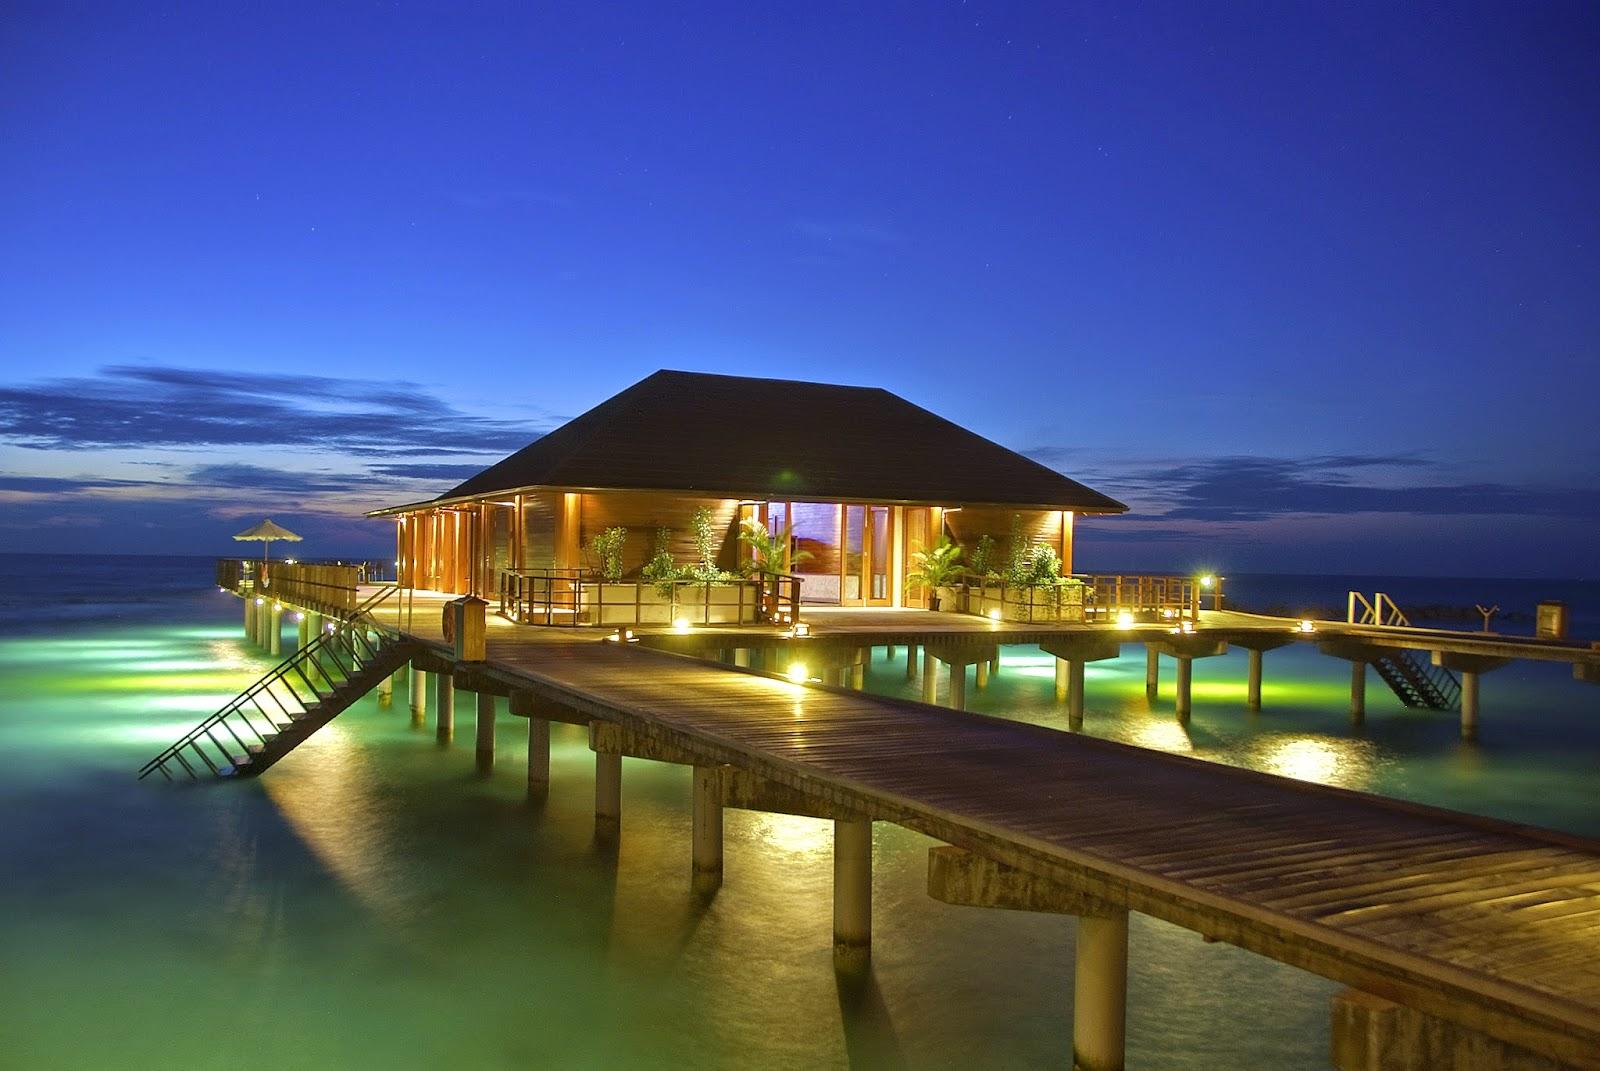 maldives-from-chisinau-3